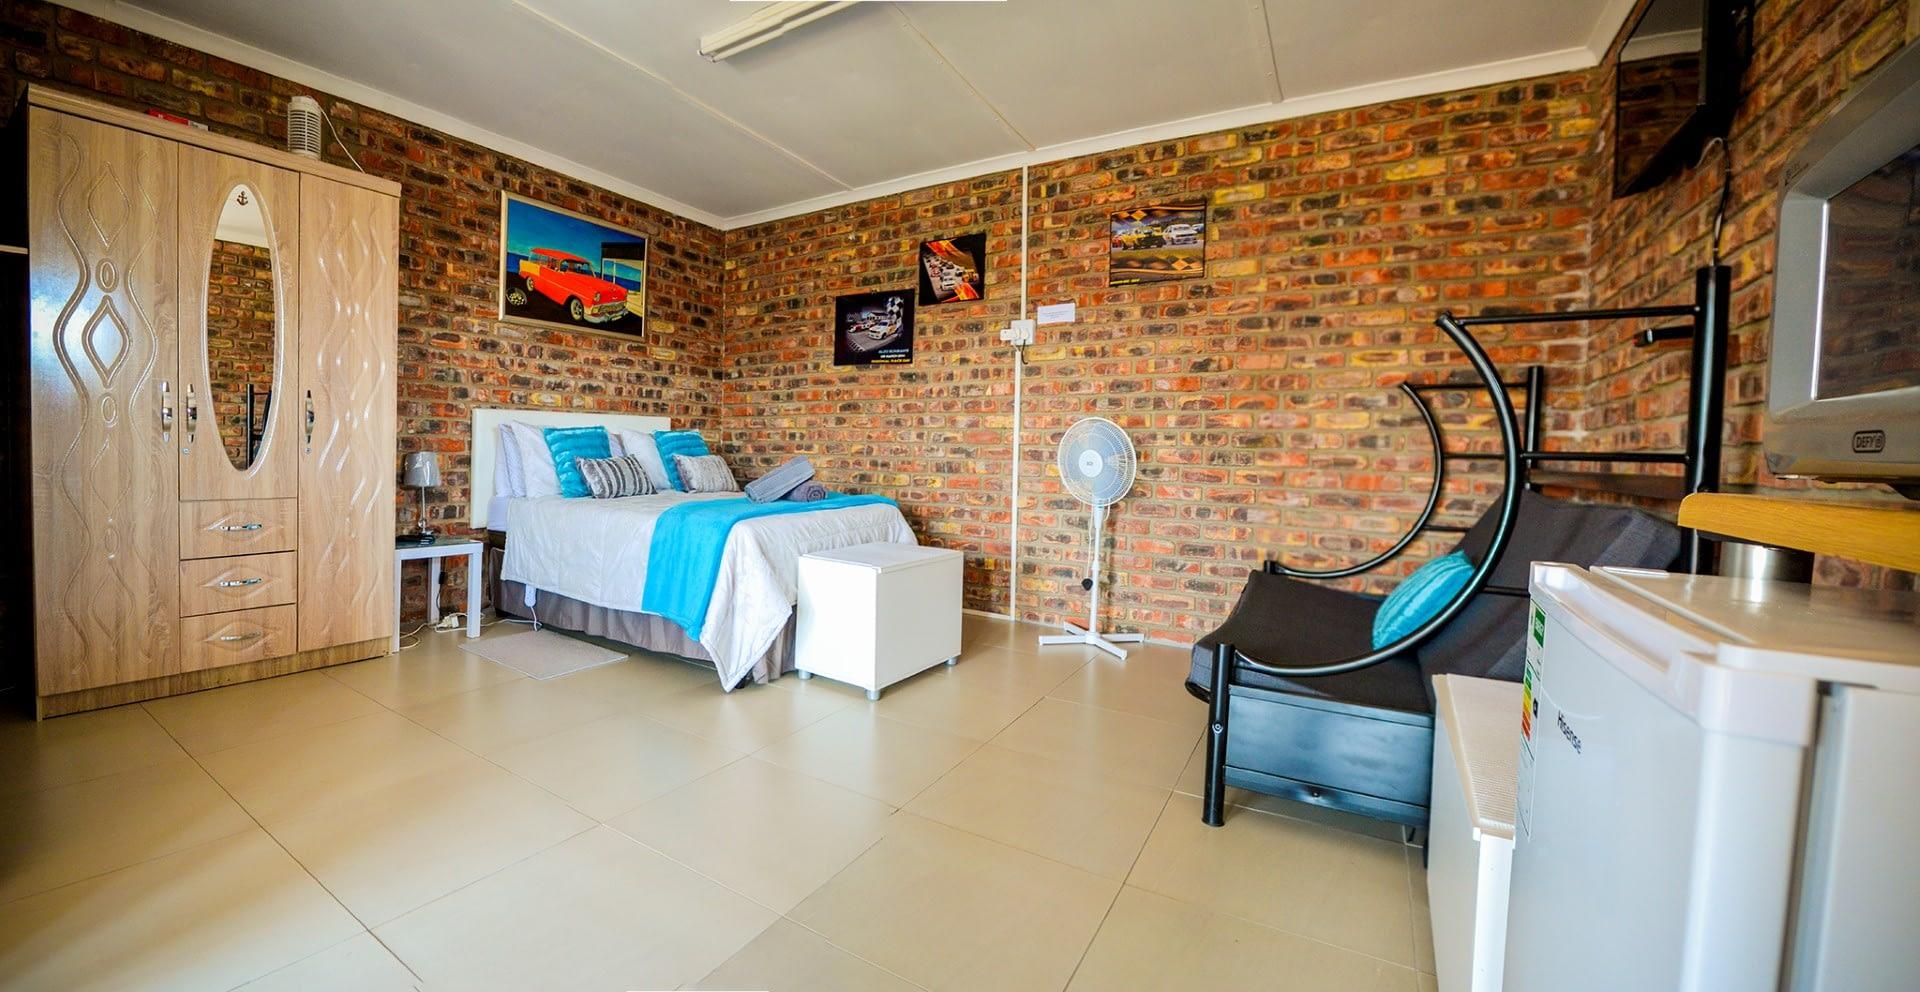 Accommodation near Addo ColchesteAccommodation near Addo Colchester South Africa Big 5 Port Elizabethr South Africa Big 5 Port Elizabeth